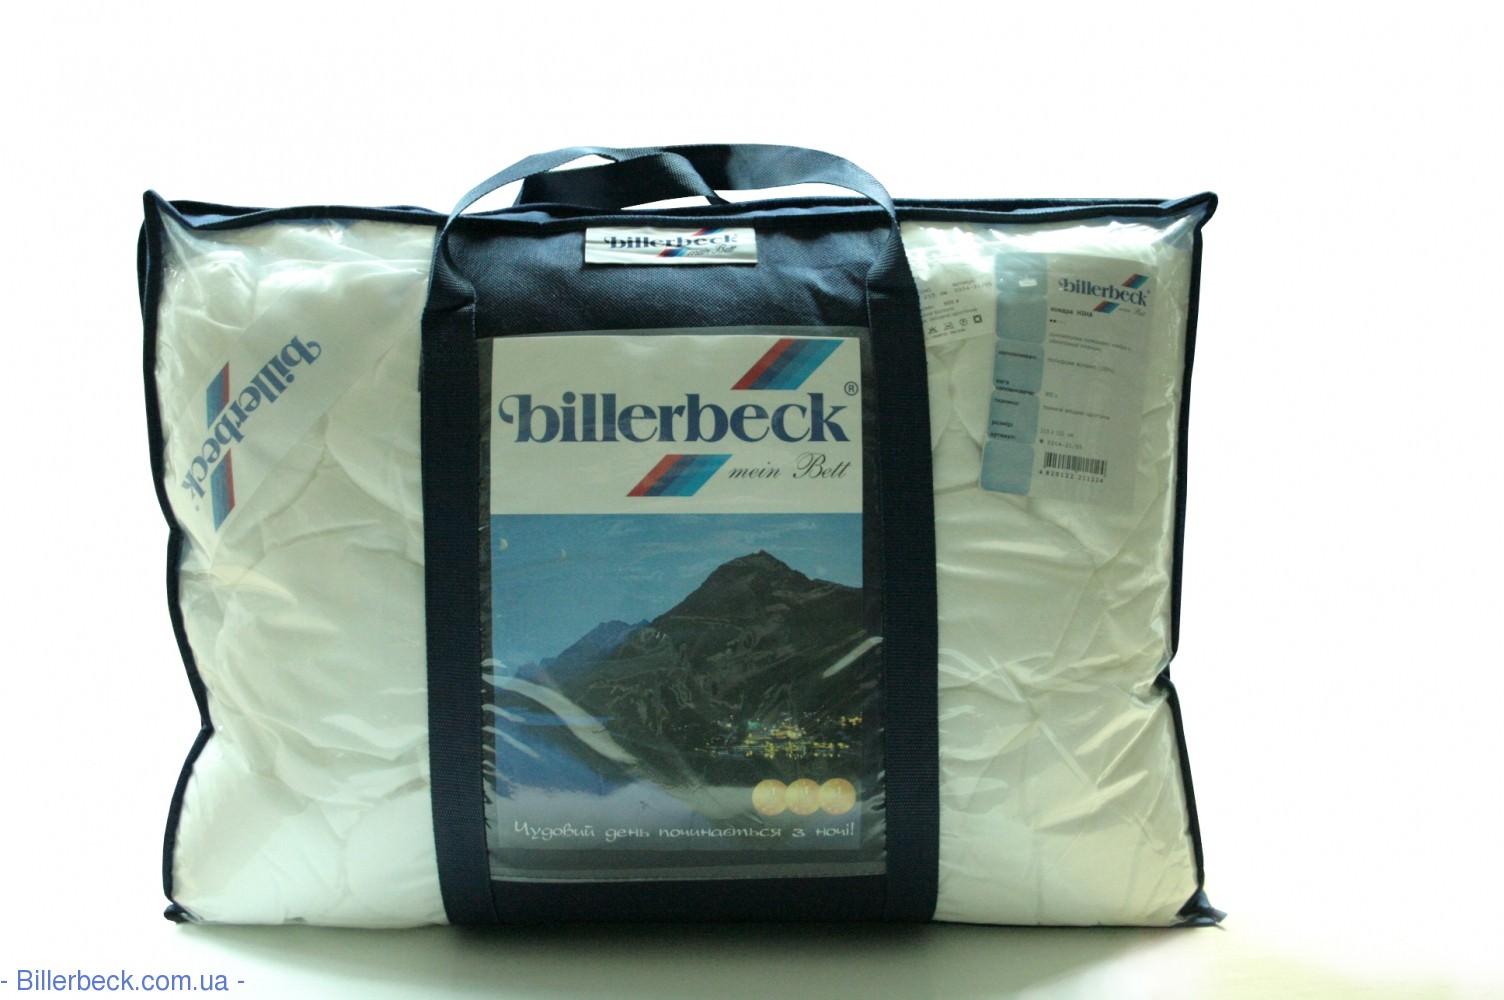 Одеяло Нина легкое Billerbeck - 3